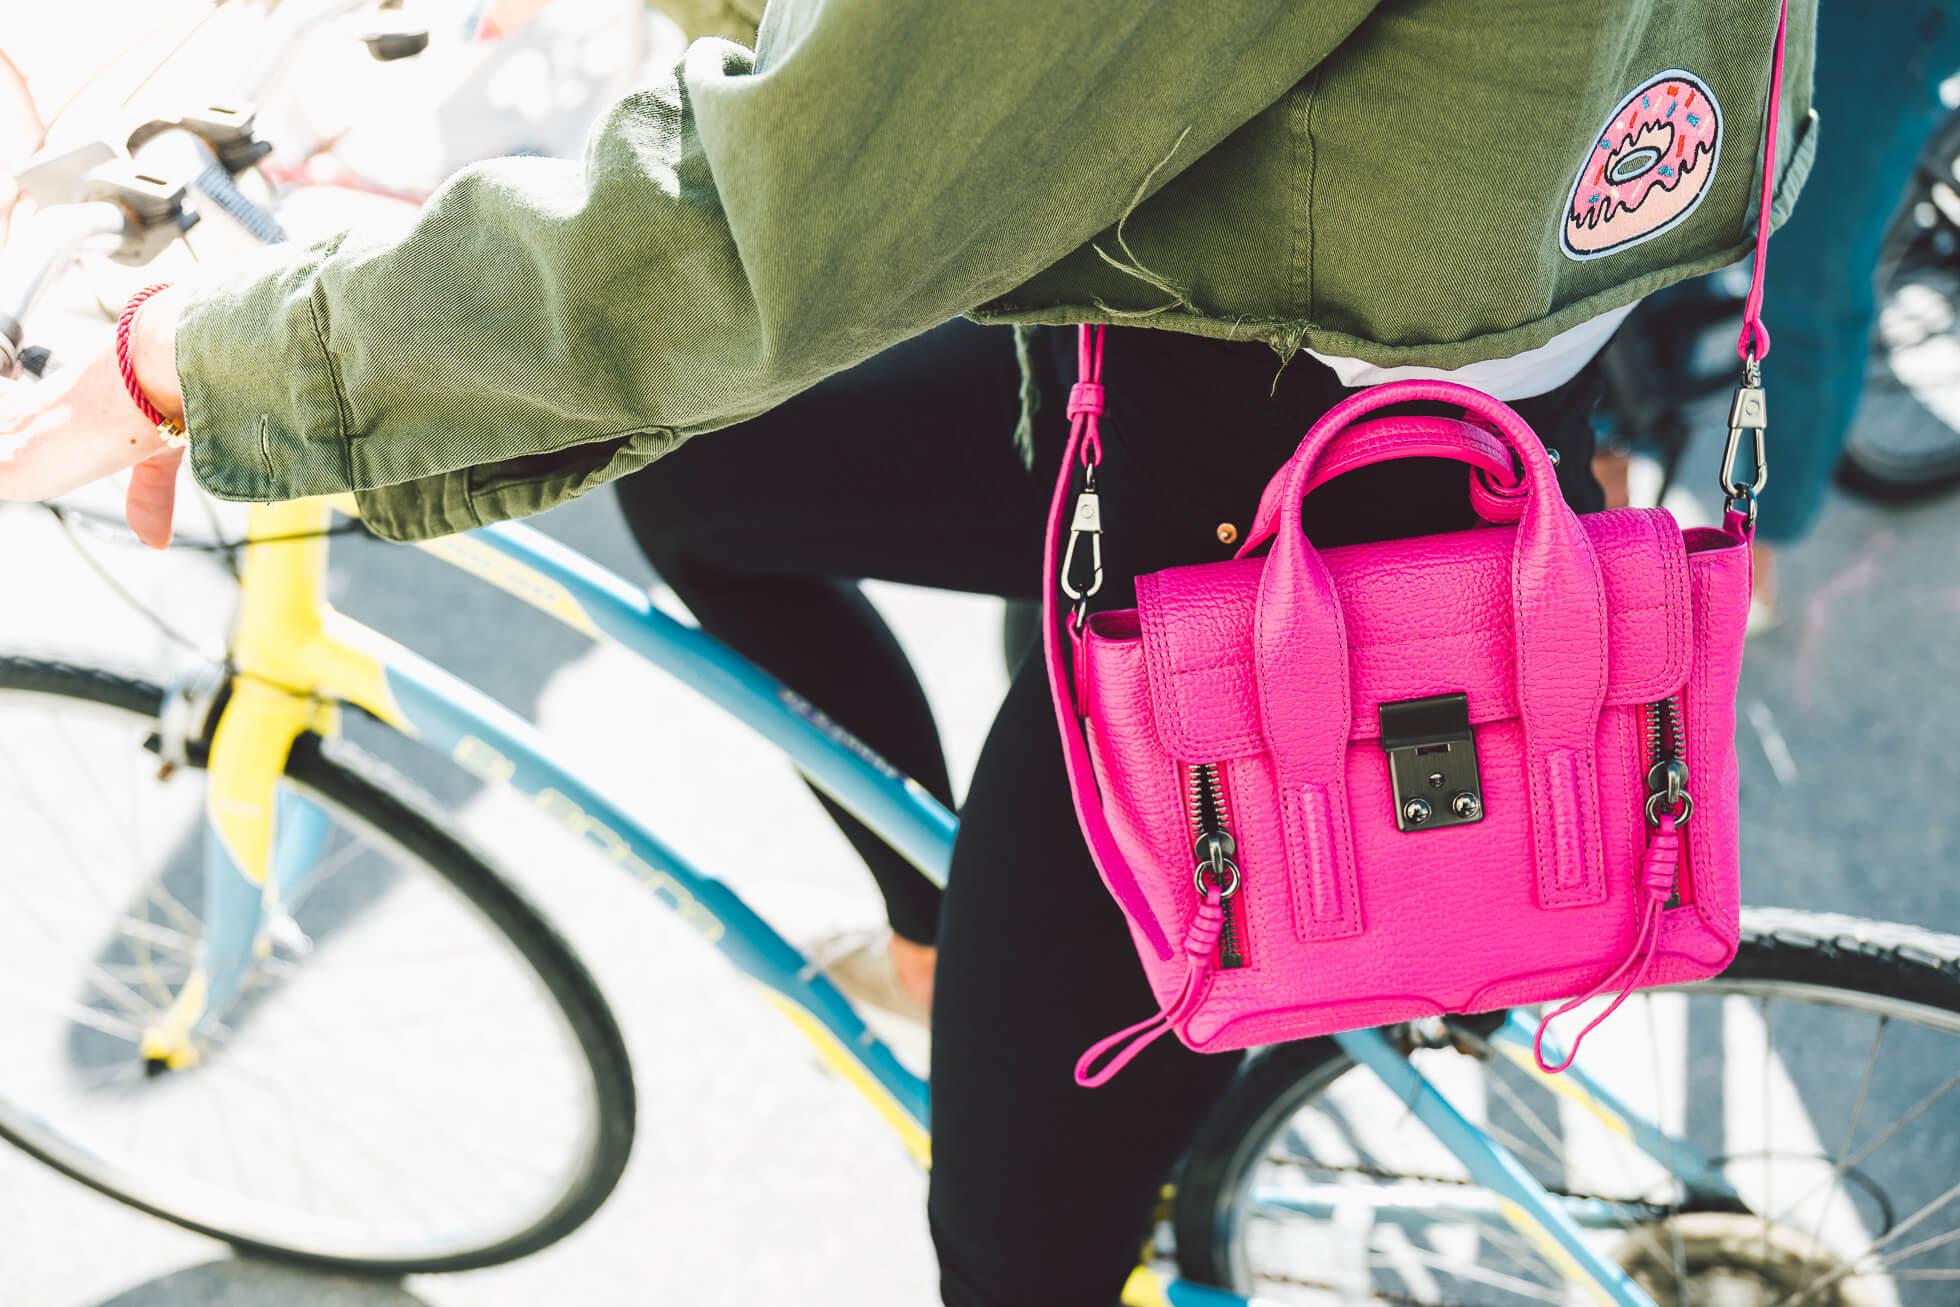 janni-deler-bike-ride-veniceL1010452